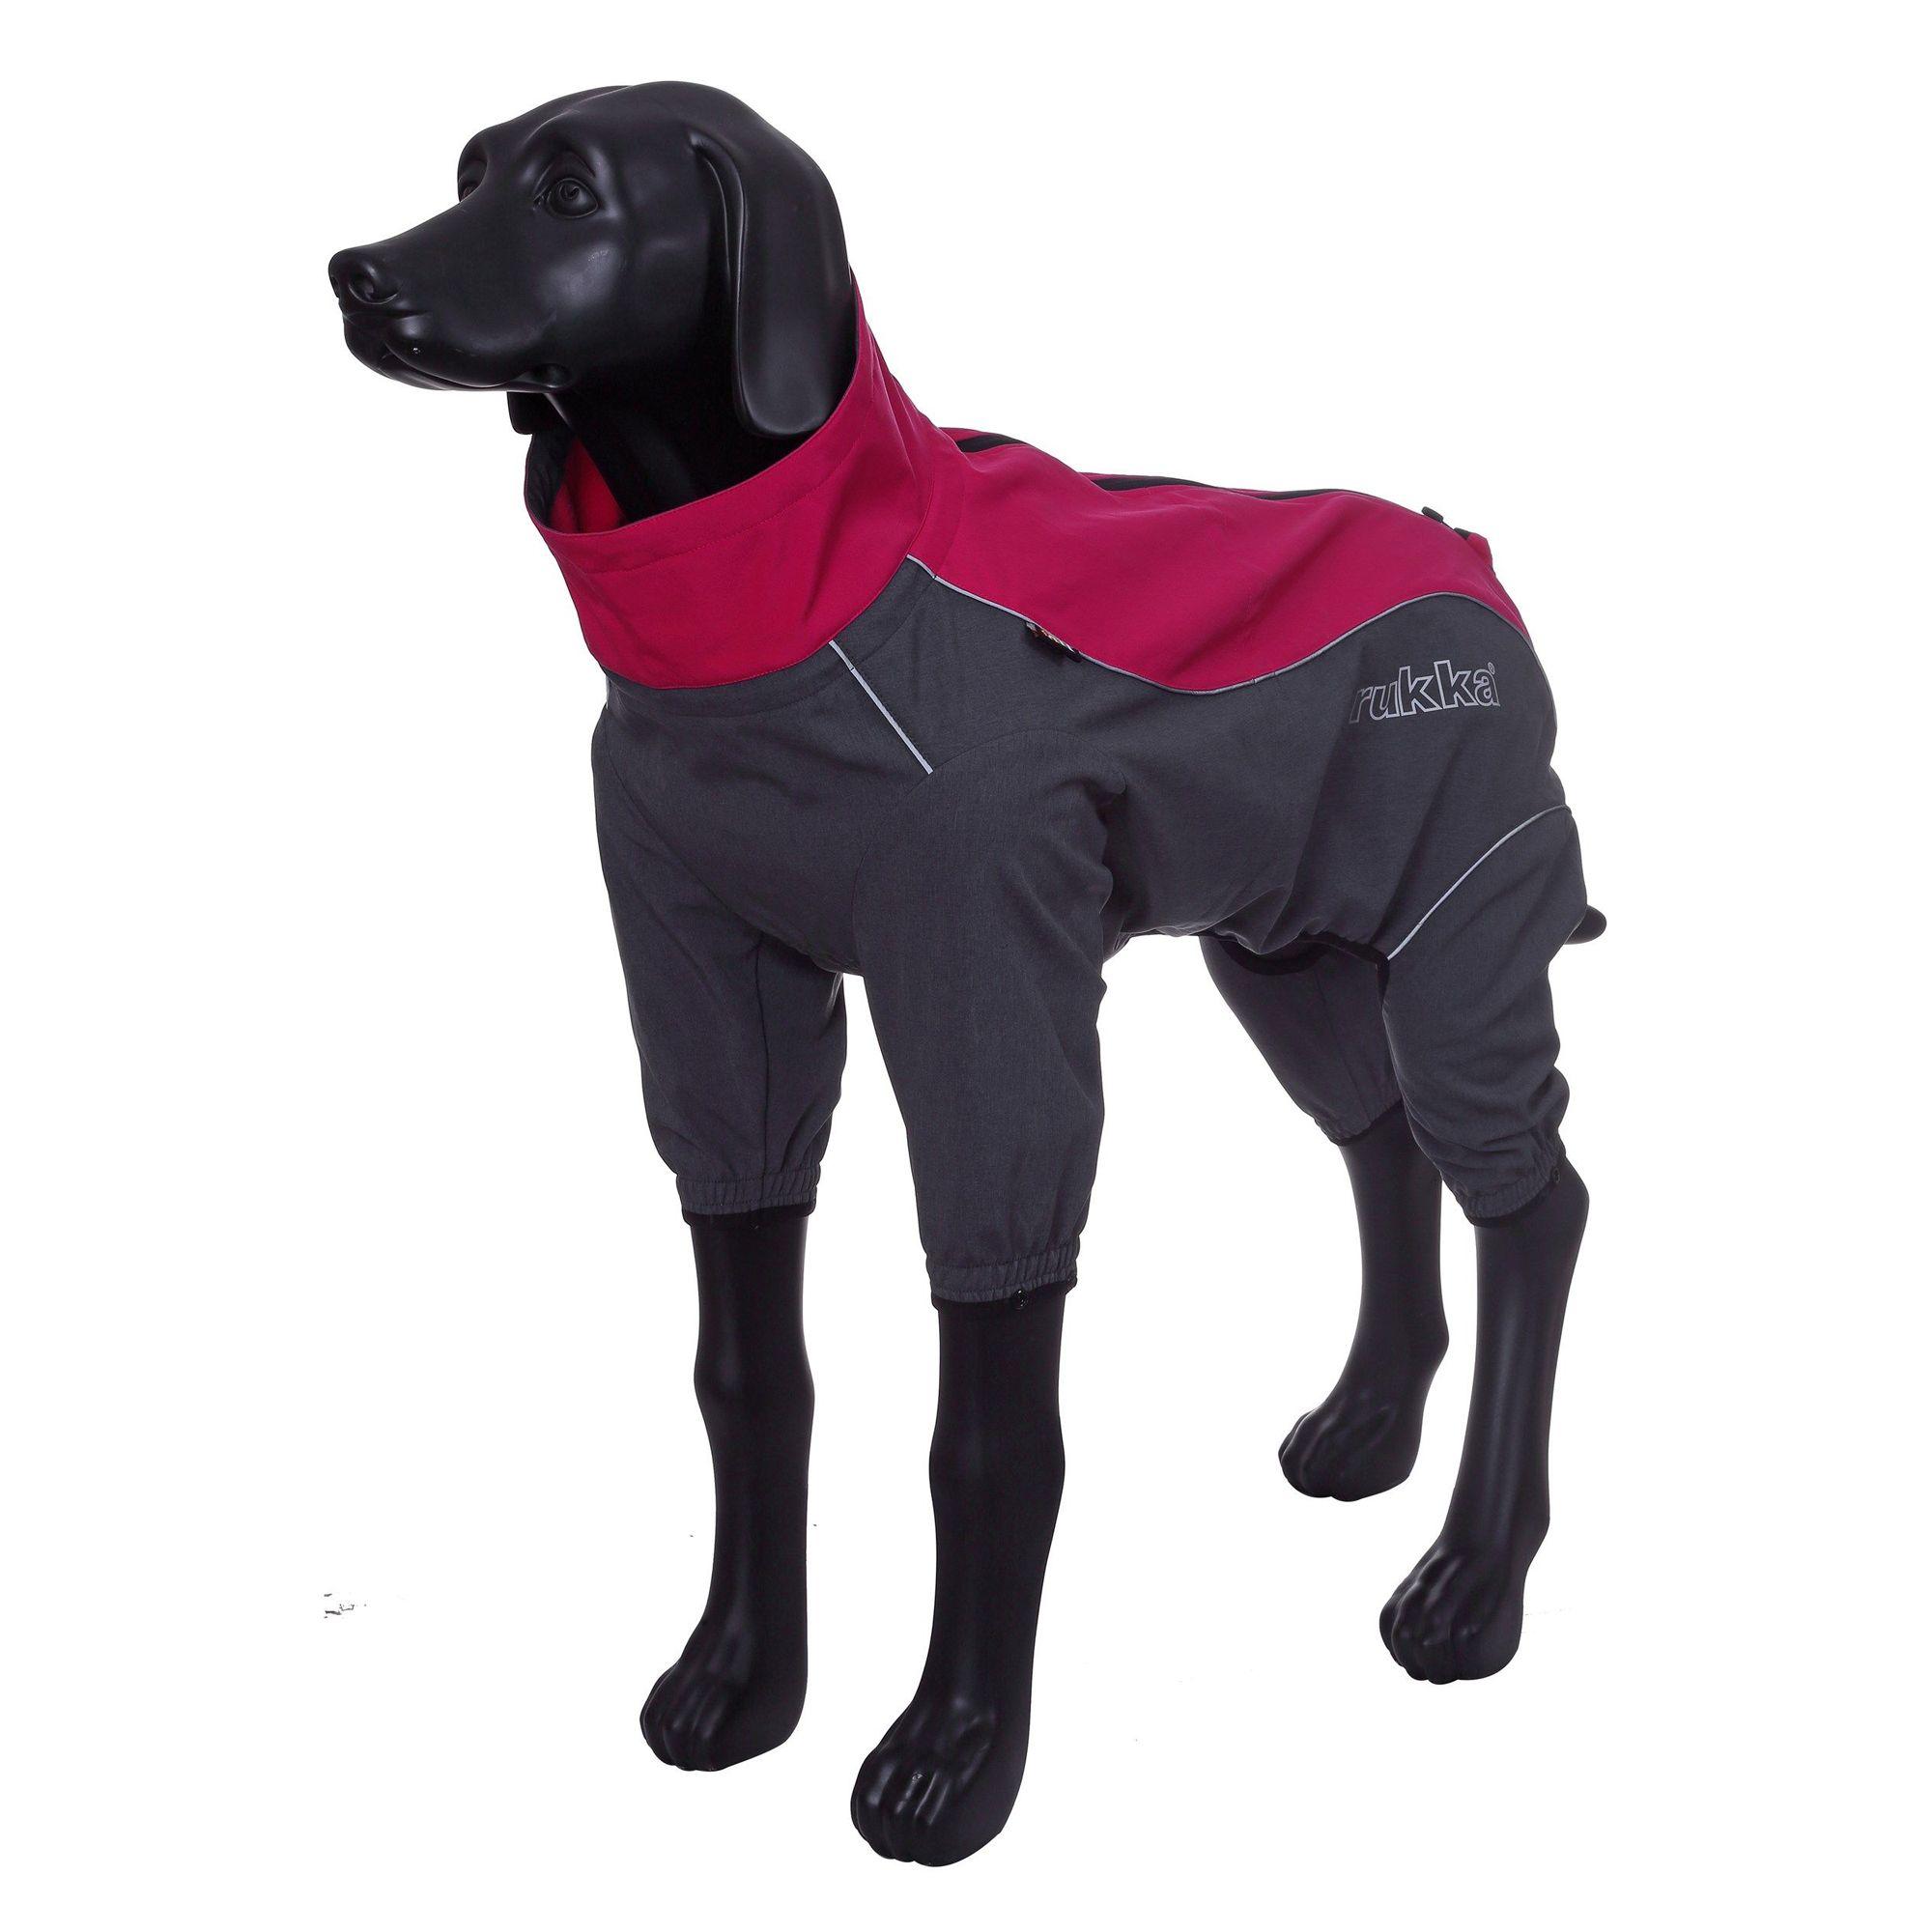 Комбинезон для собак RUKKA Windmaster Solid красный 25см все цены